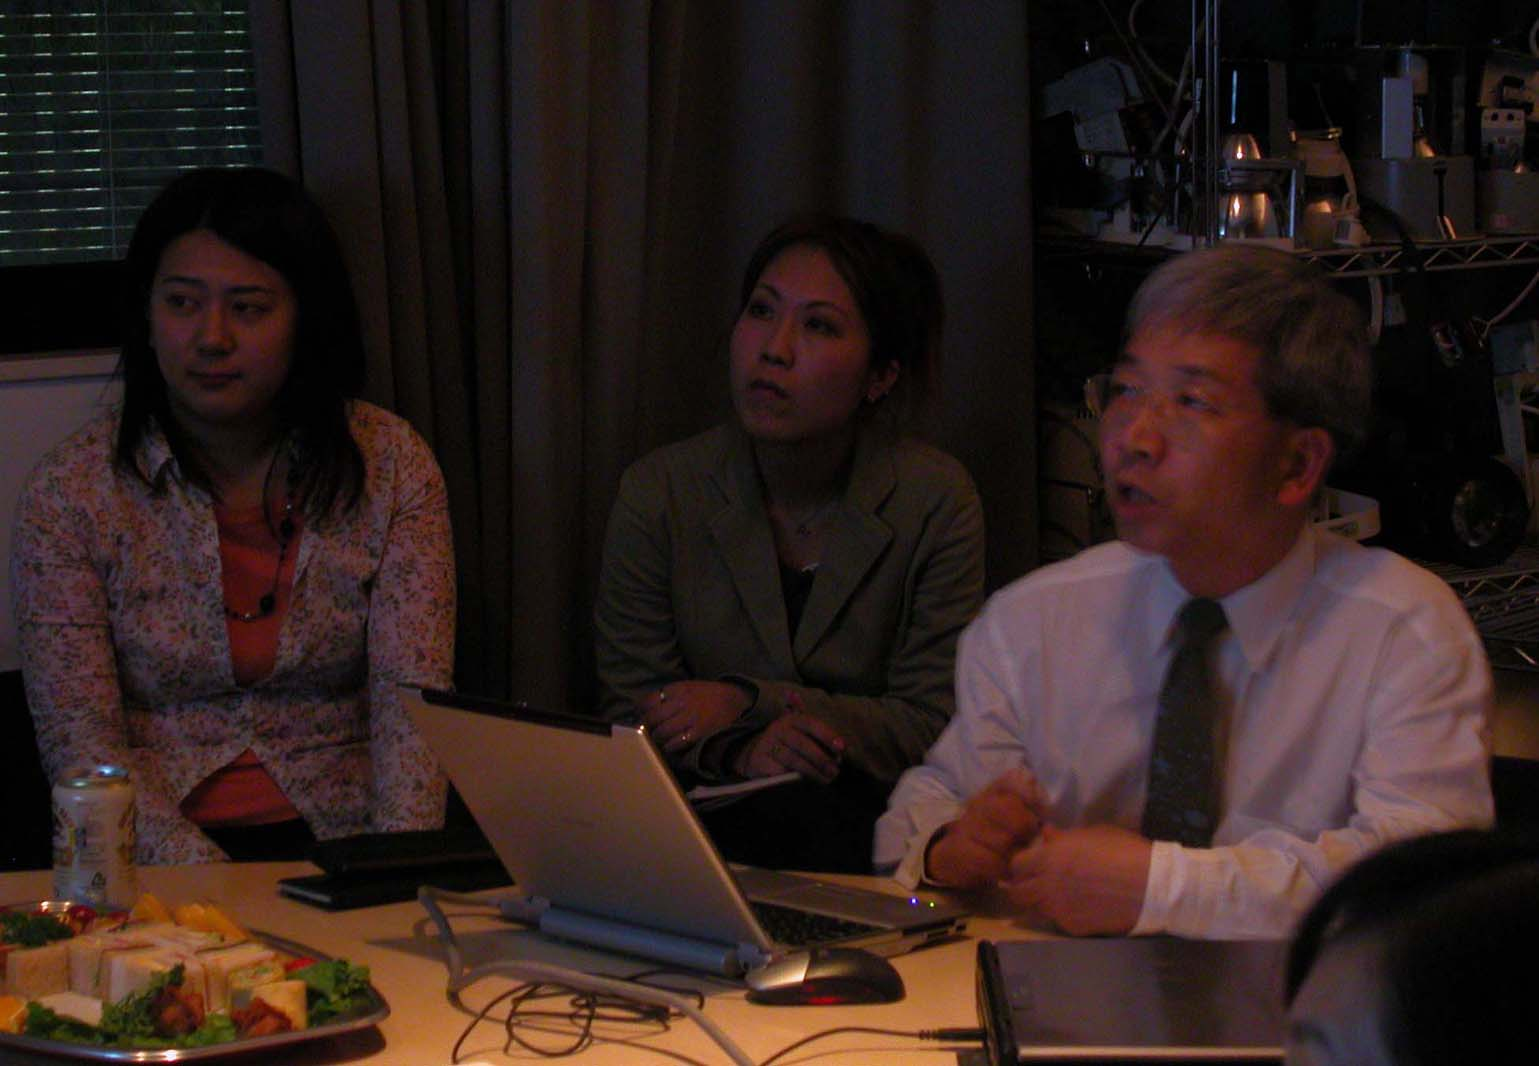 研究会・サロン2006:渋谷 照明探偵団事務局